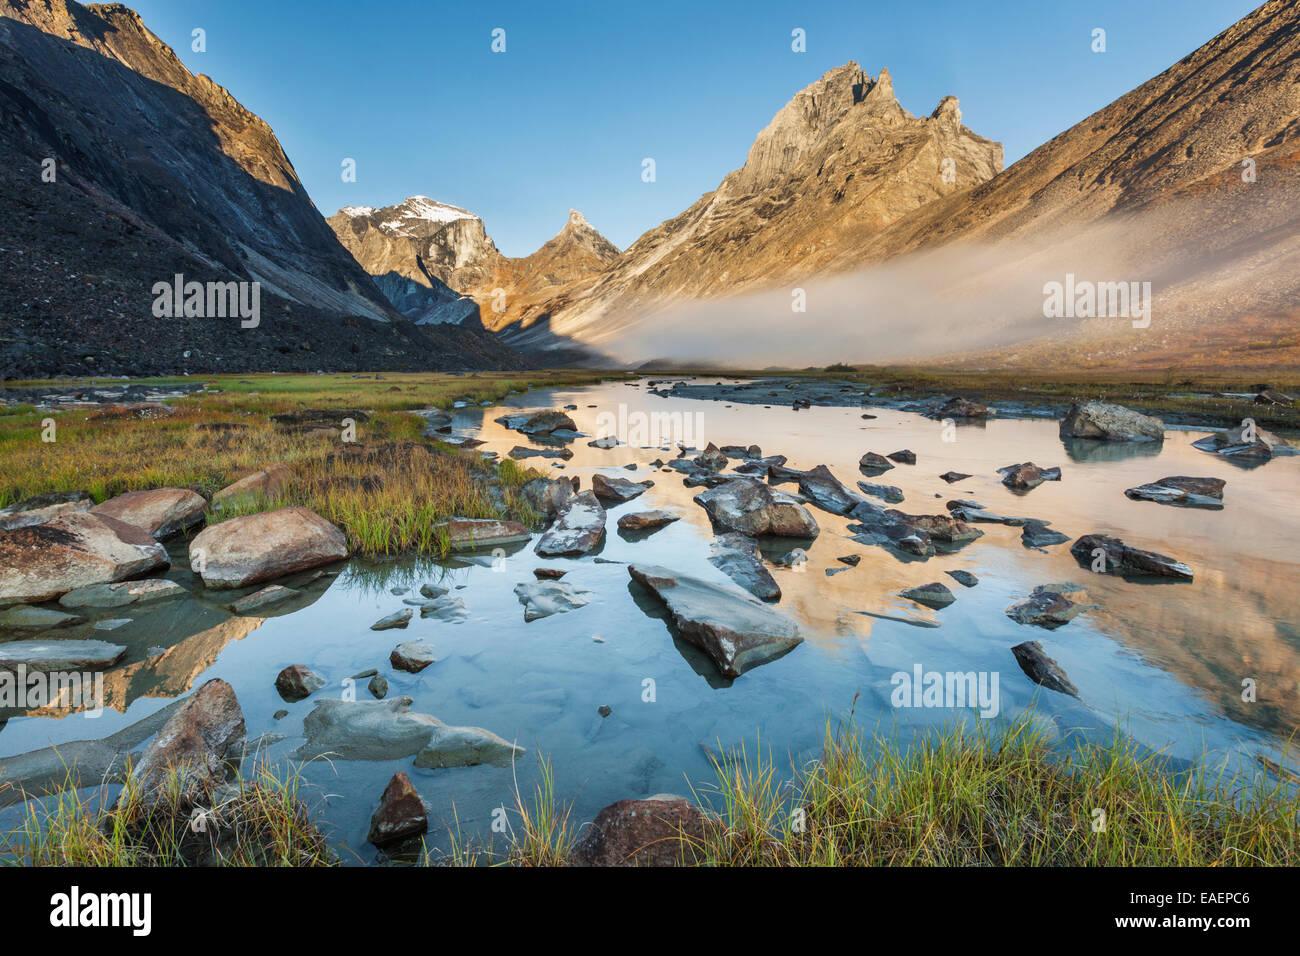 Mountain,Reflection,Arial,caliban,xanadu - Stock Image